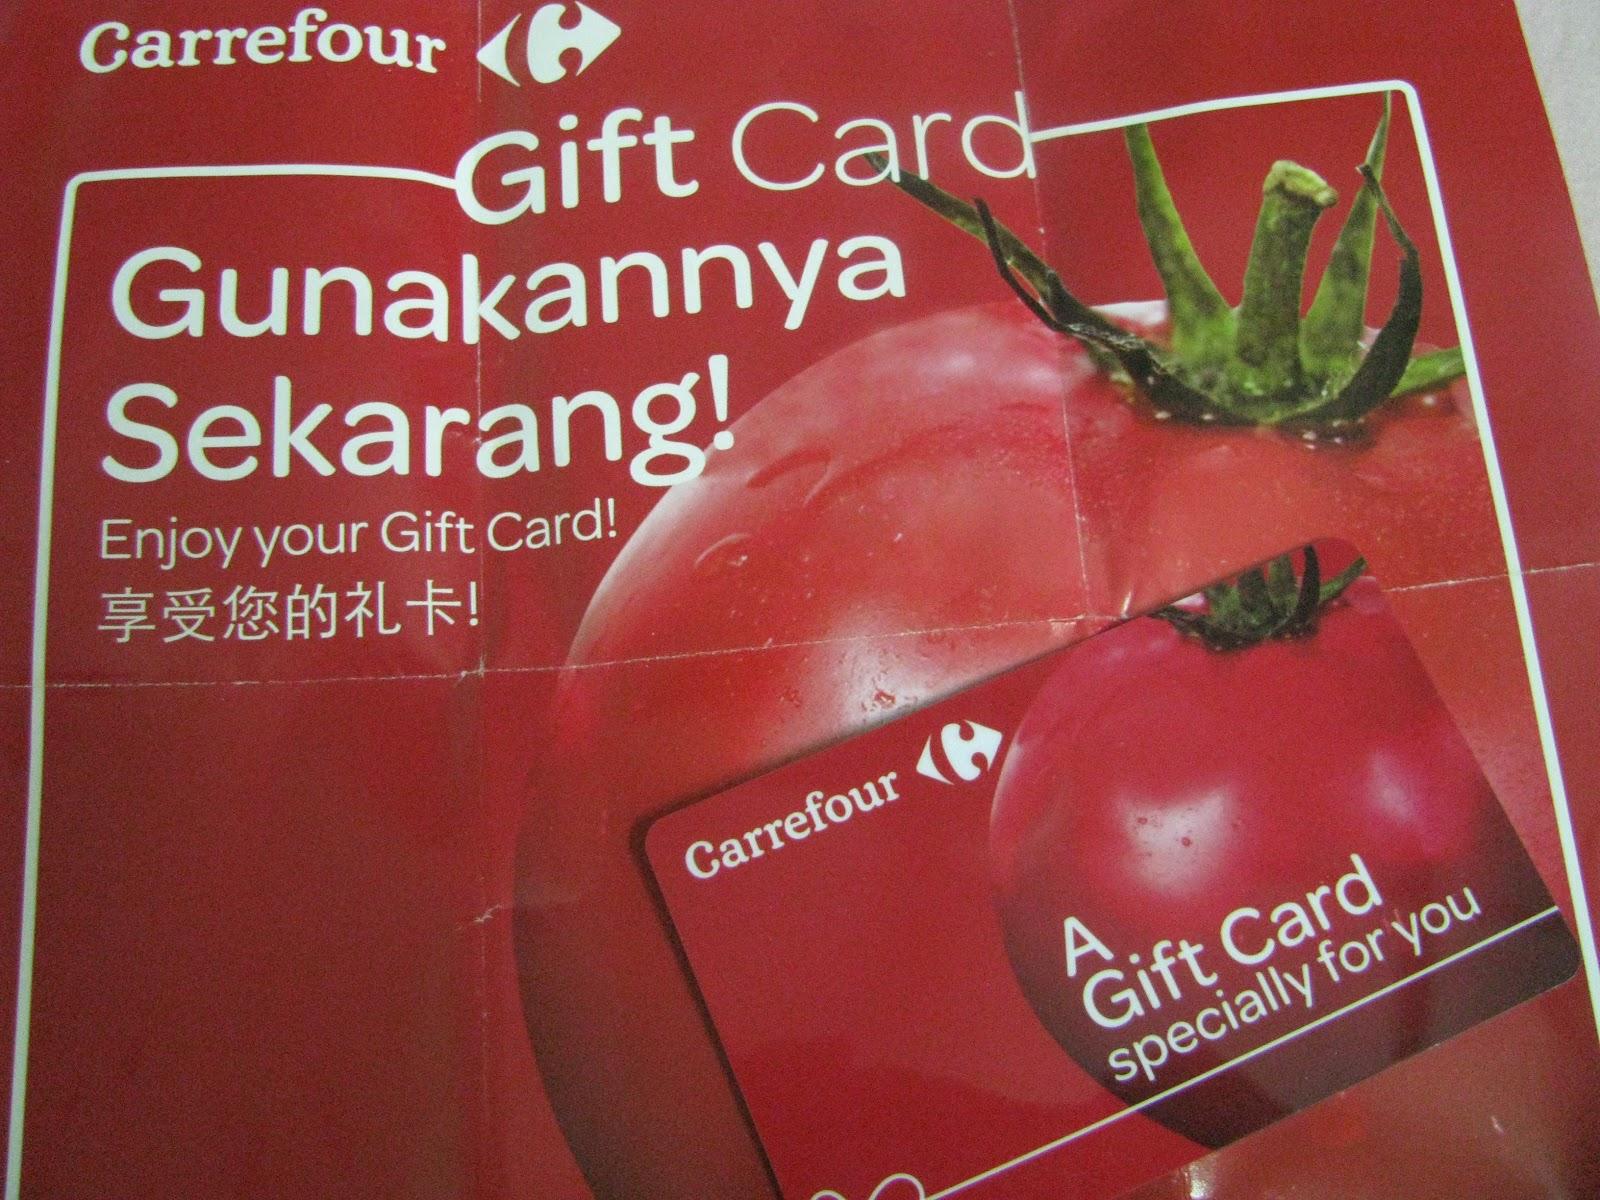 Carrefour Gift Card Balance